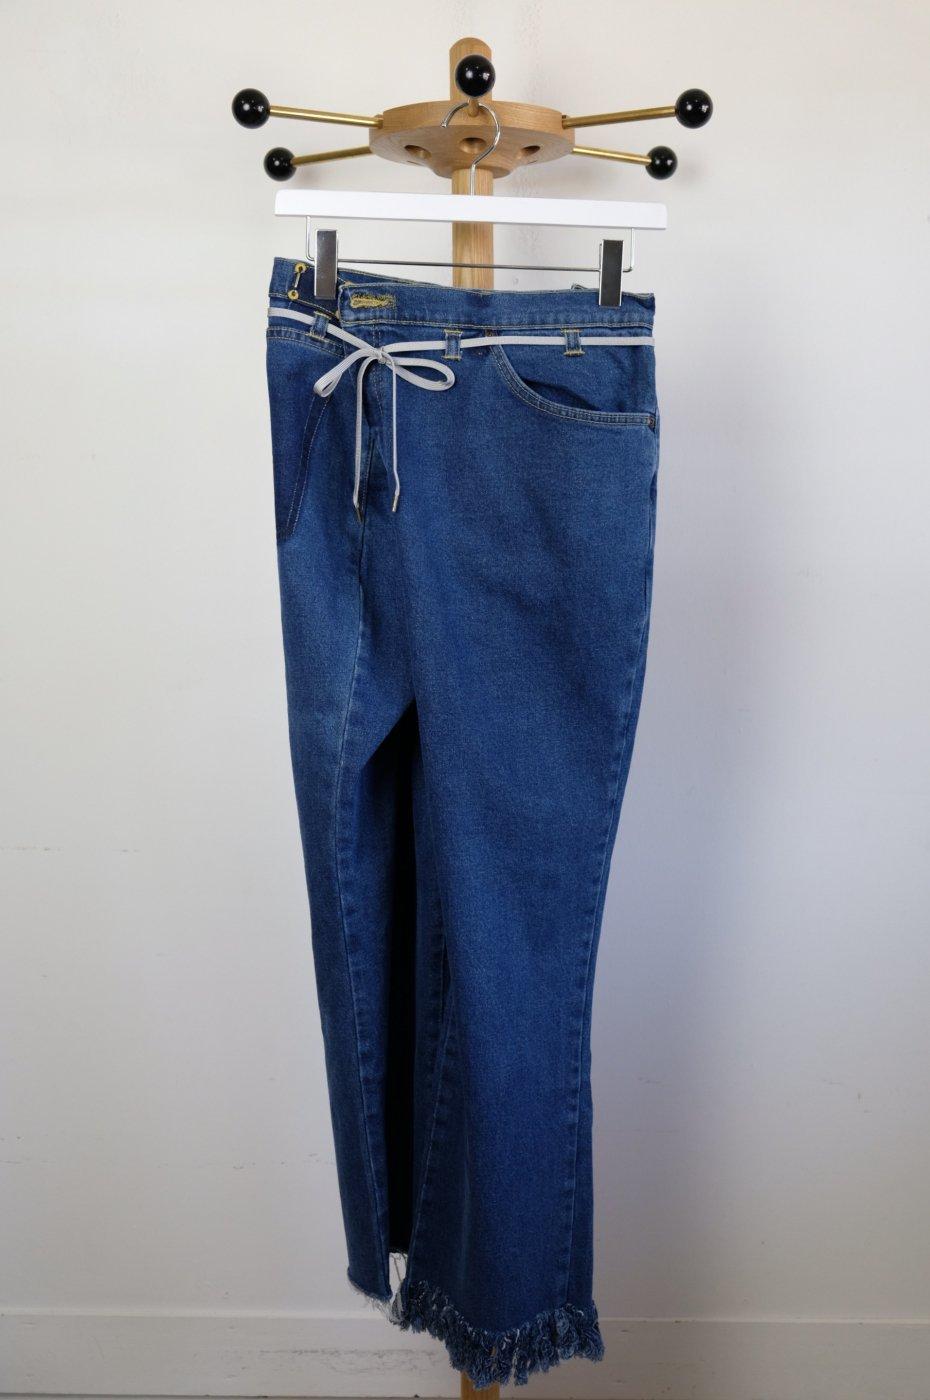 MAISON EUREKA メゾンエウレカ-VINTAGE REWORK BIGGY PANTS-BLUE-#5